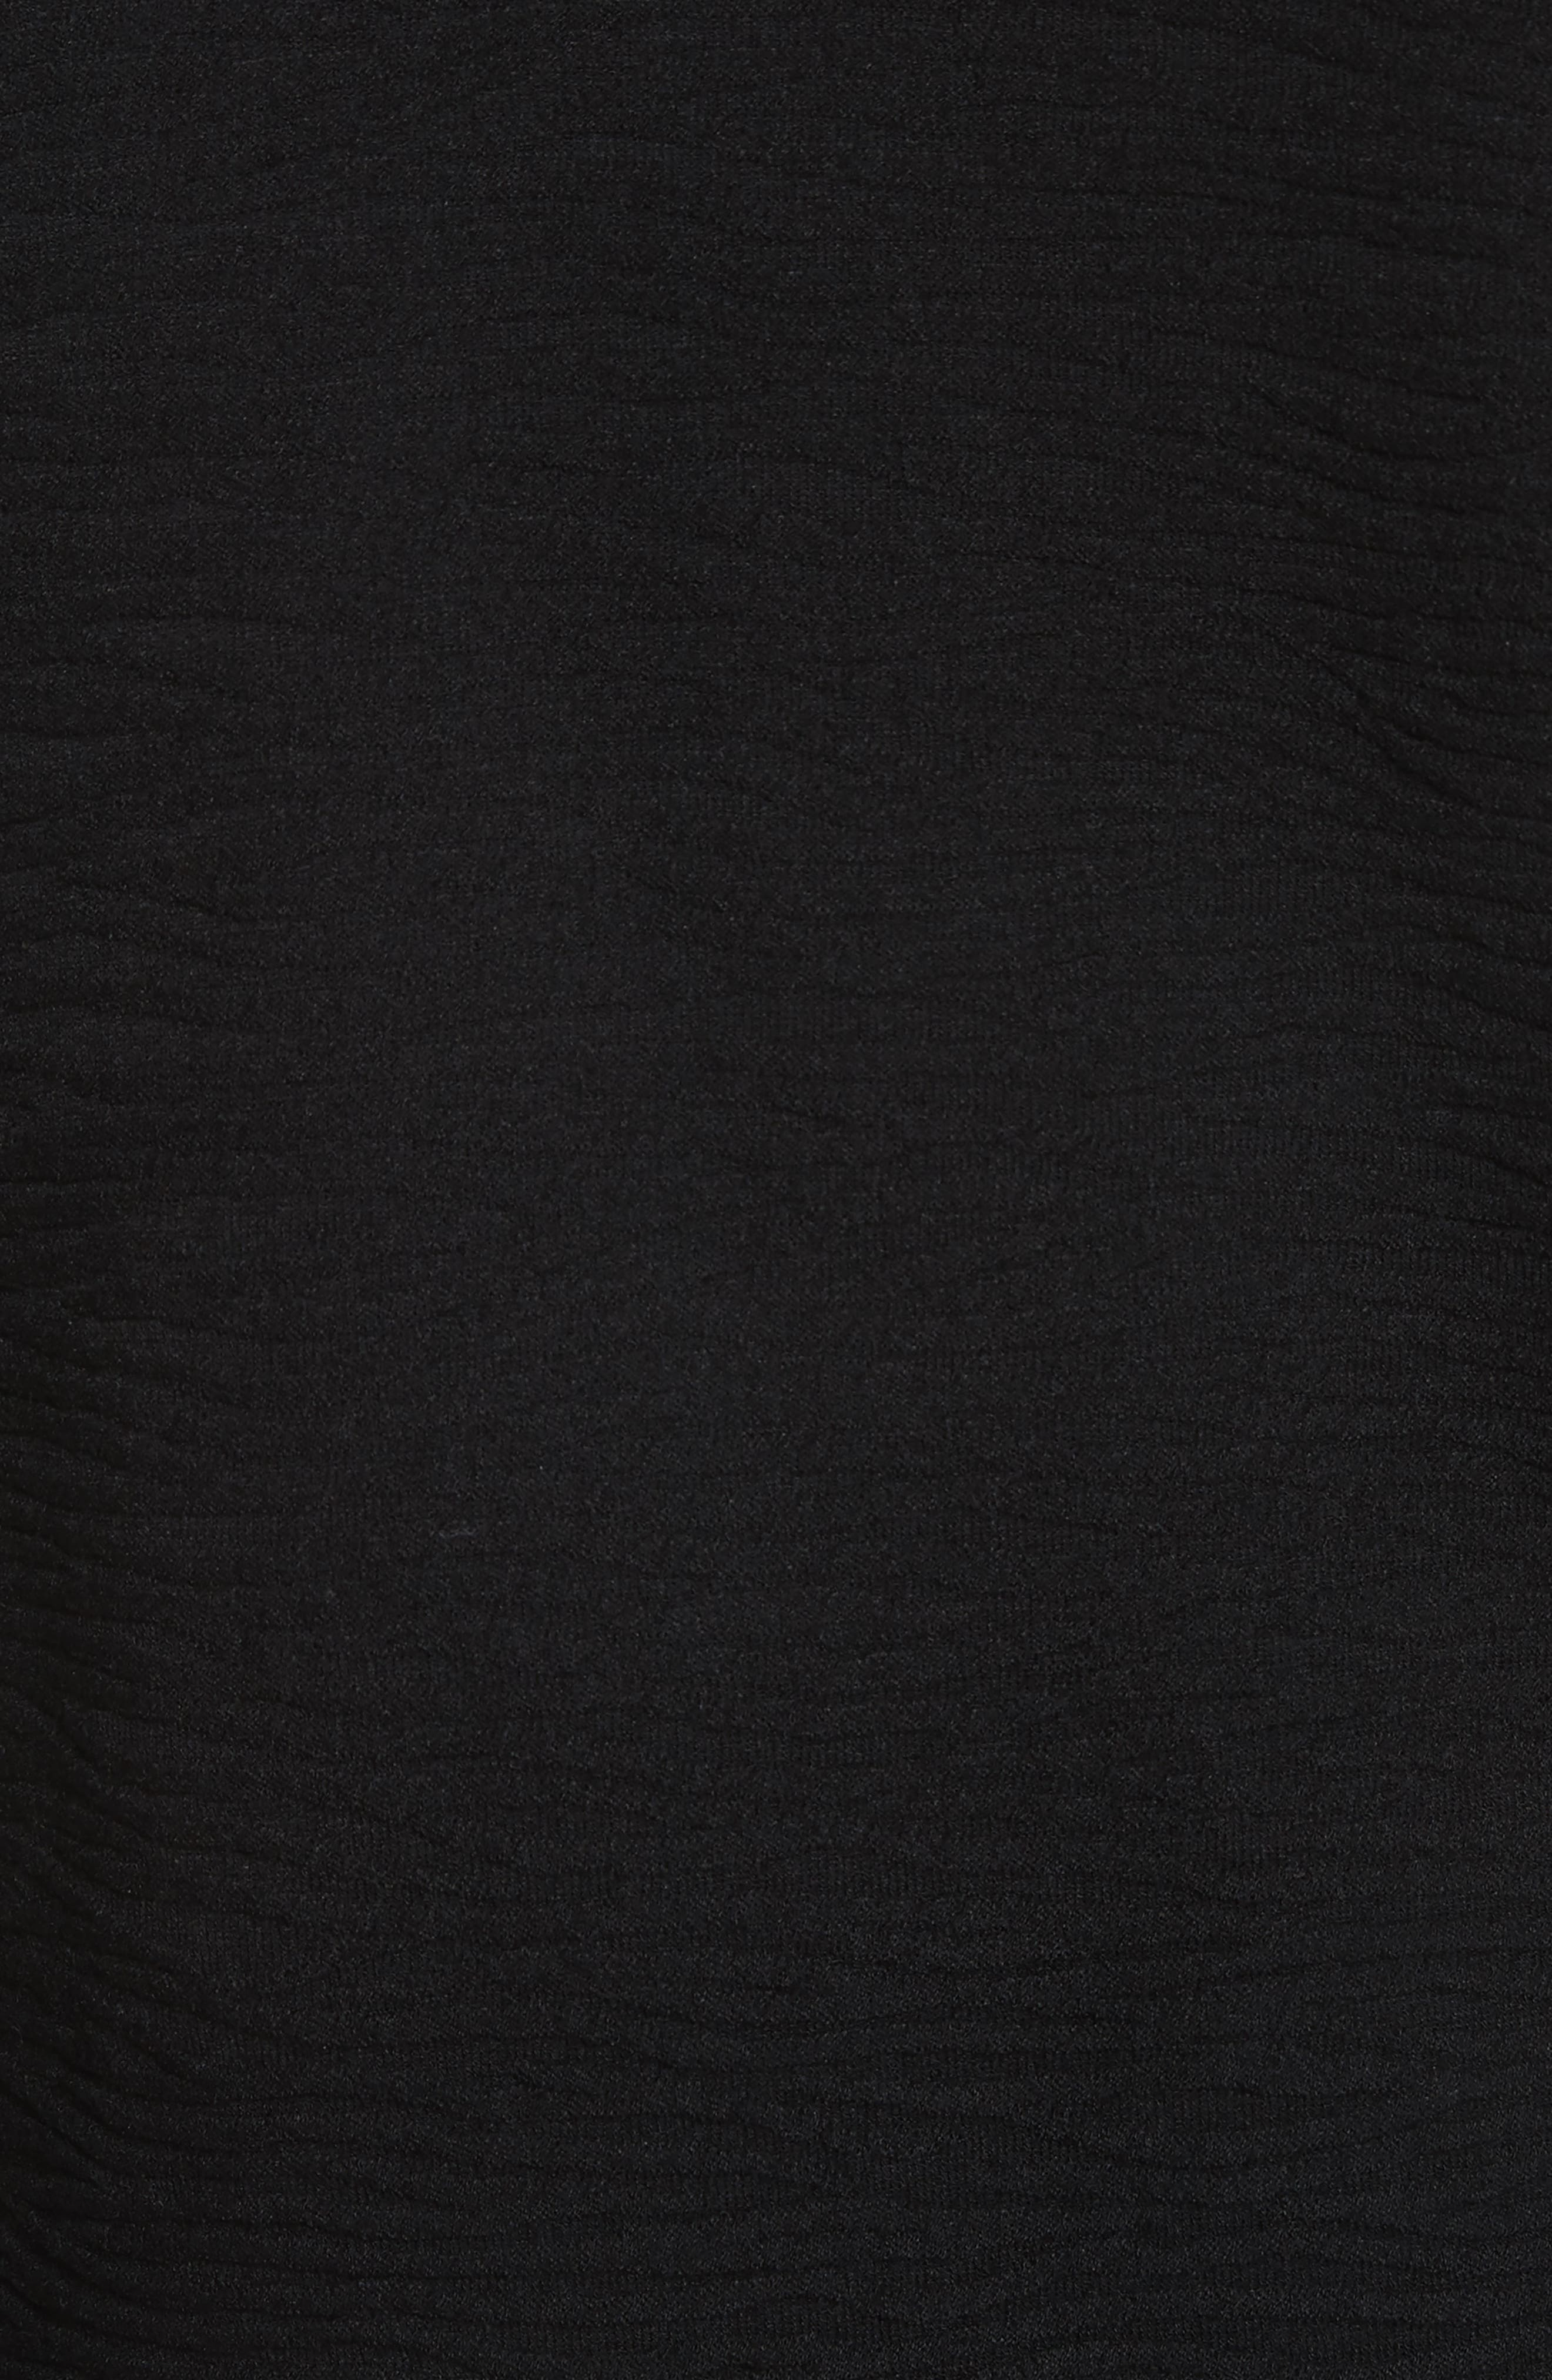 Slim Fit Allover Links Sweater,                             Alternate thumbnail 5, color,                             Black